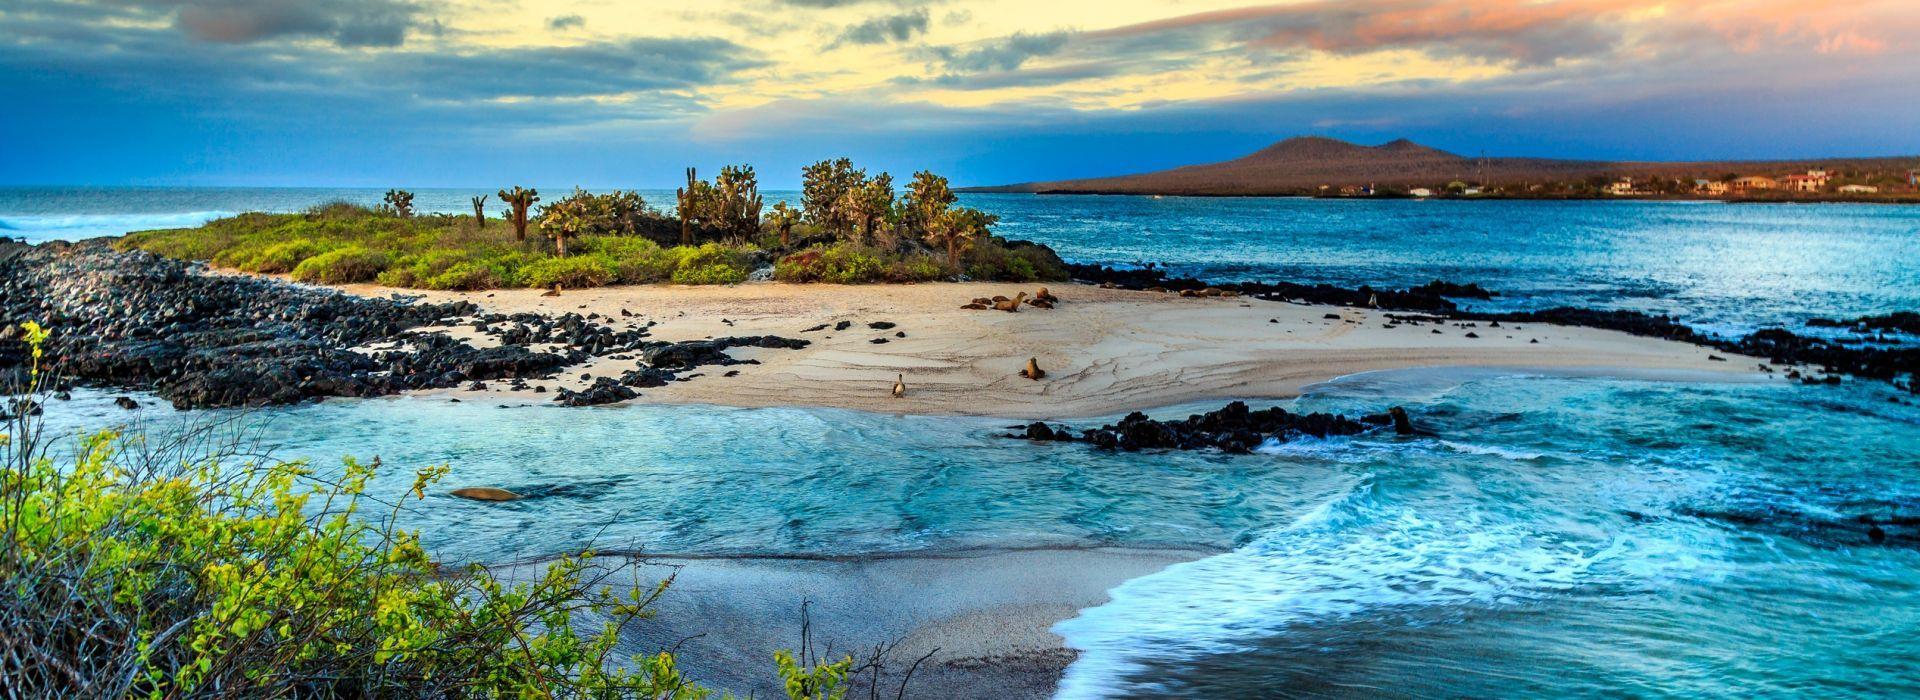 San Cristobal Island Tours